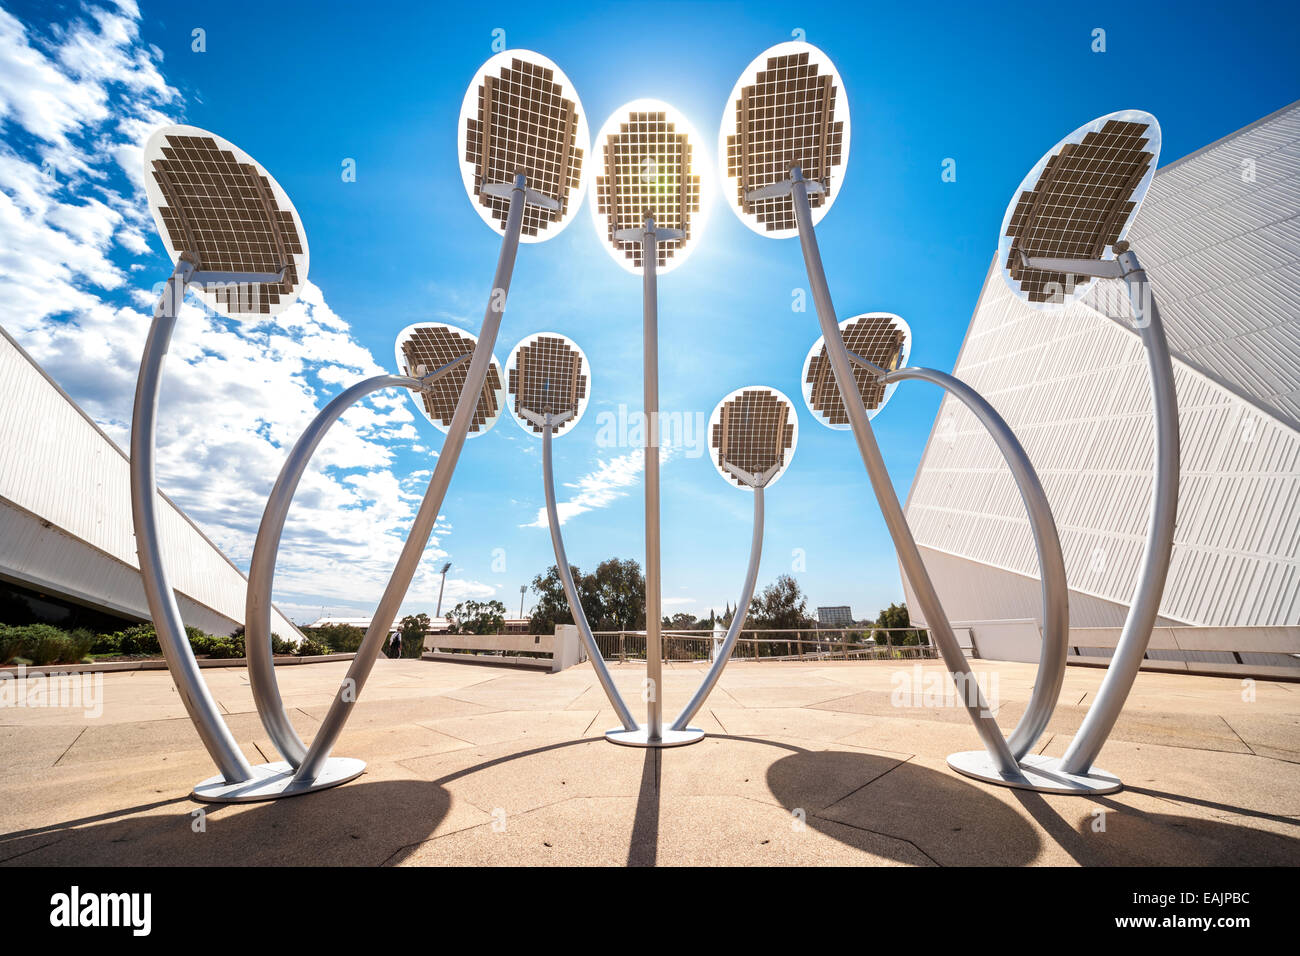 Solar powered led lights as street lighting aka The Solar Mallee Trees sculpture. Adelaide South Australia - Stock Image